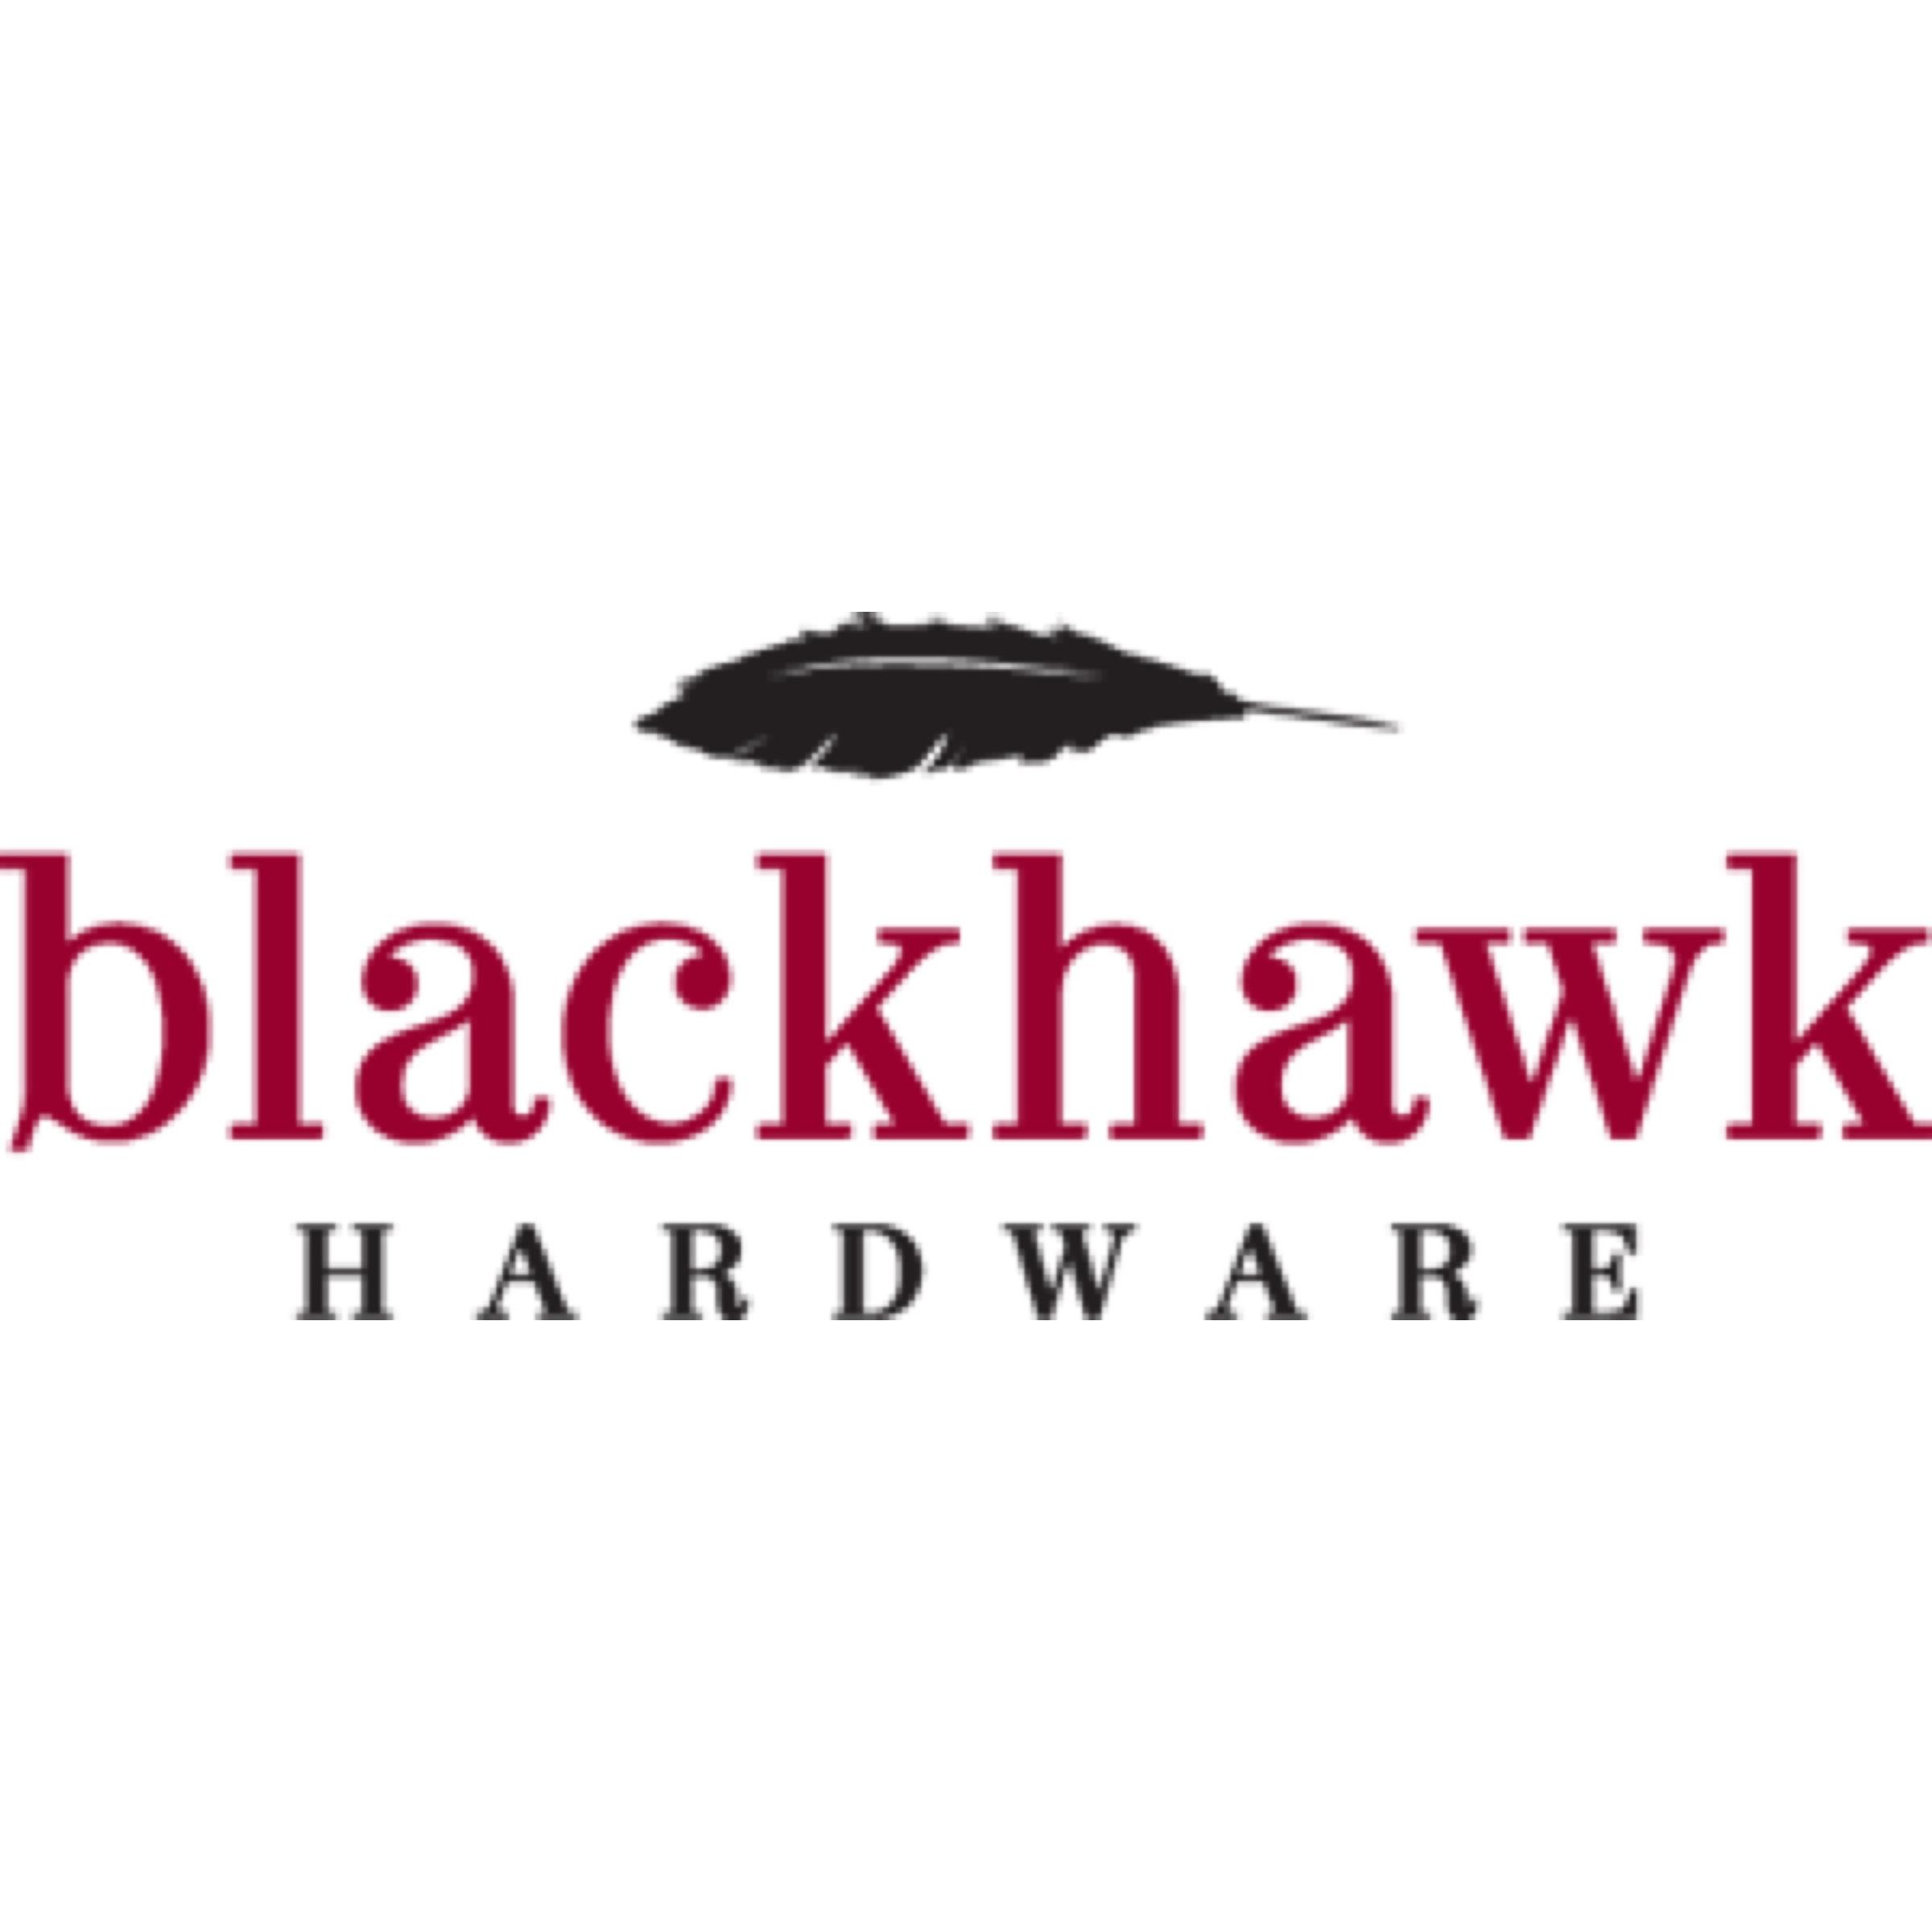 blackhawkhardware.jpg